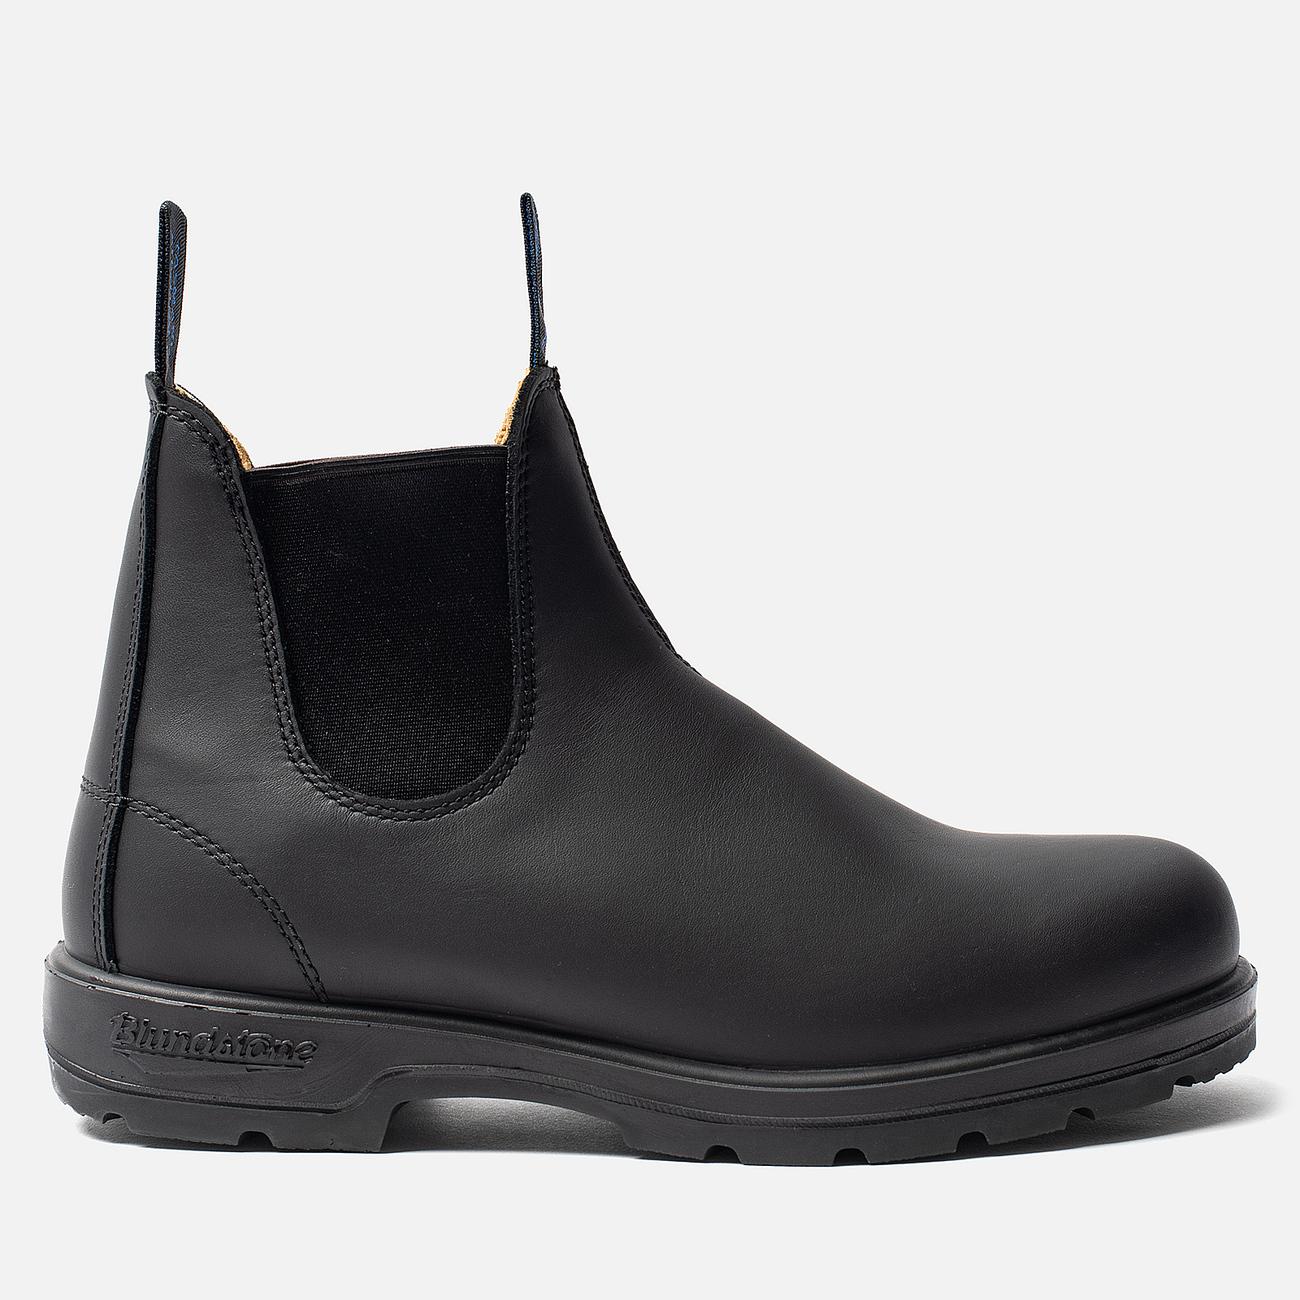 Ботинки Blundstone 566 Thermal Boots Black